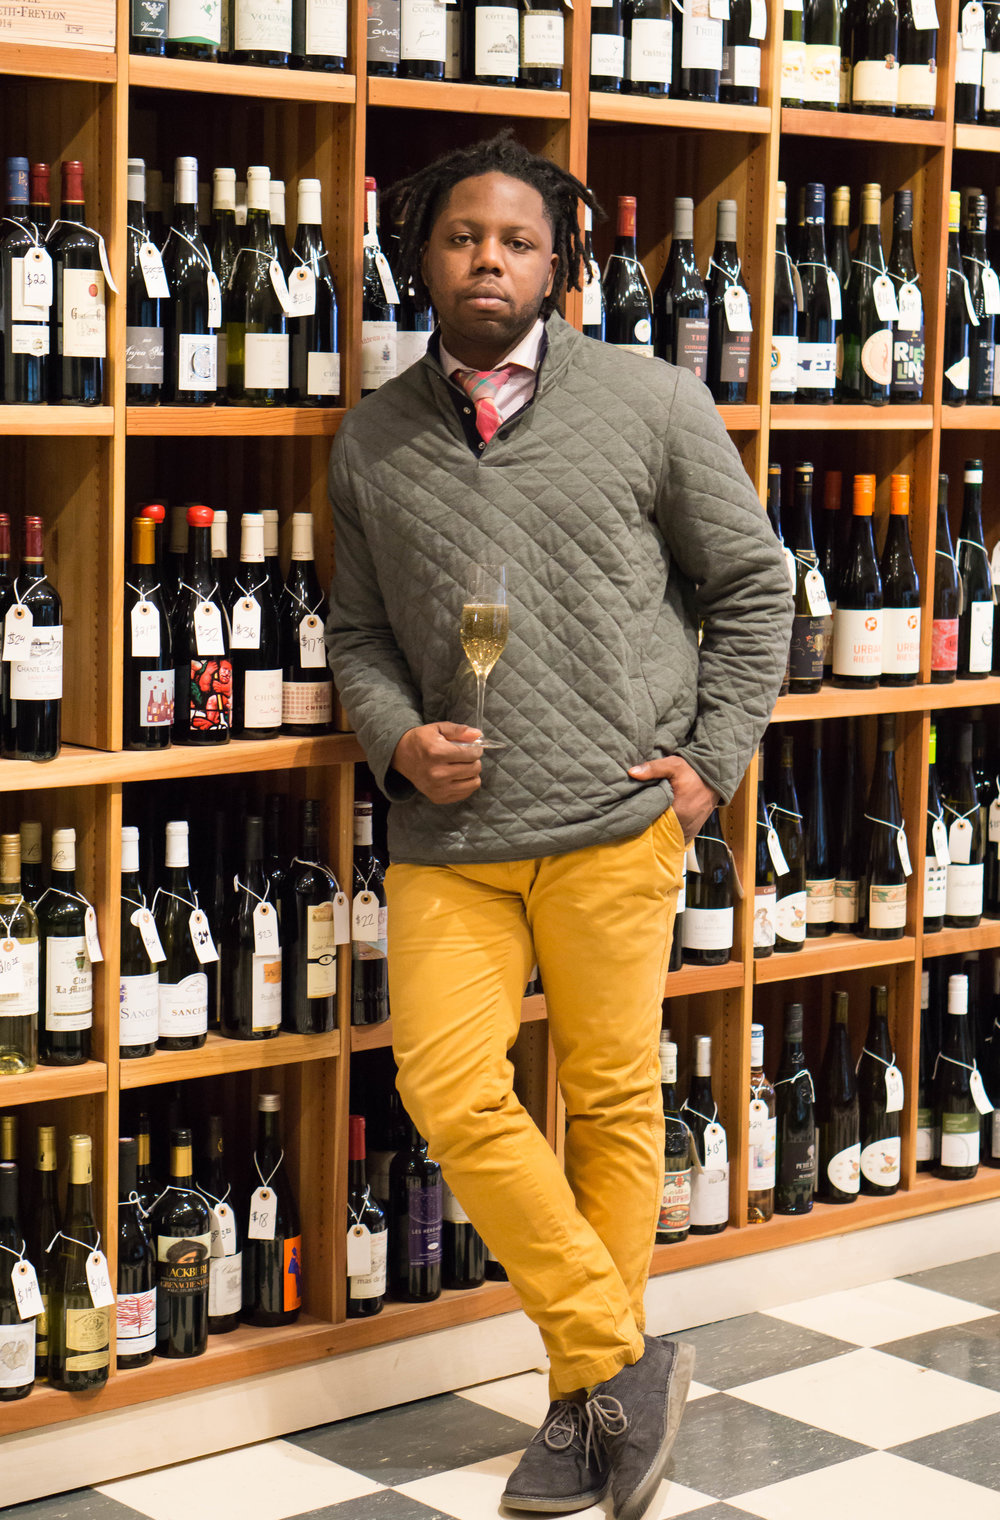 57th Street Wines-13.jpg